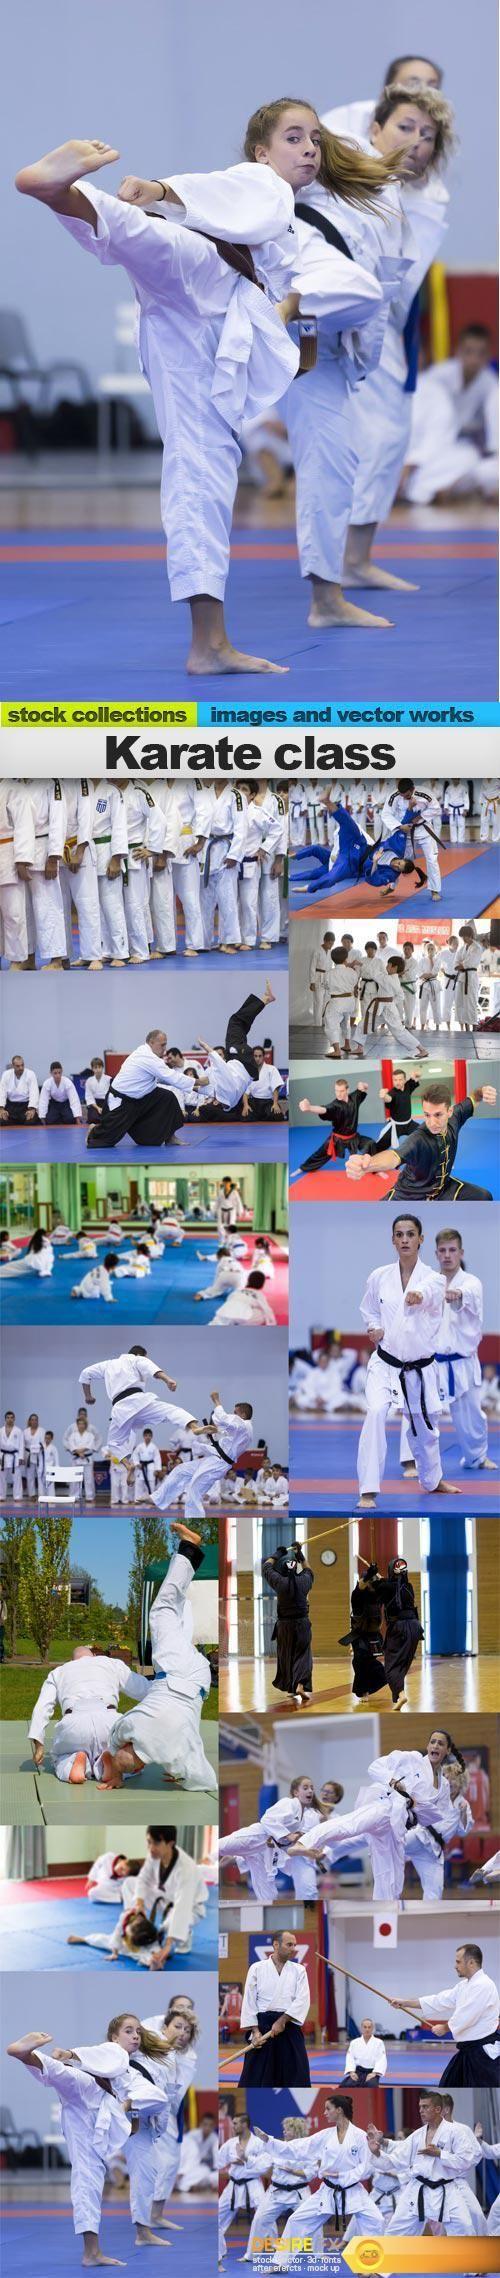 Karate class, 15 x UHQ JPEG  http://www.desirefx.me/karate-class-15-x-uhq-jpeg/